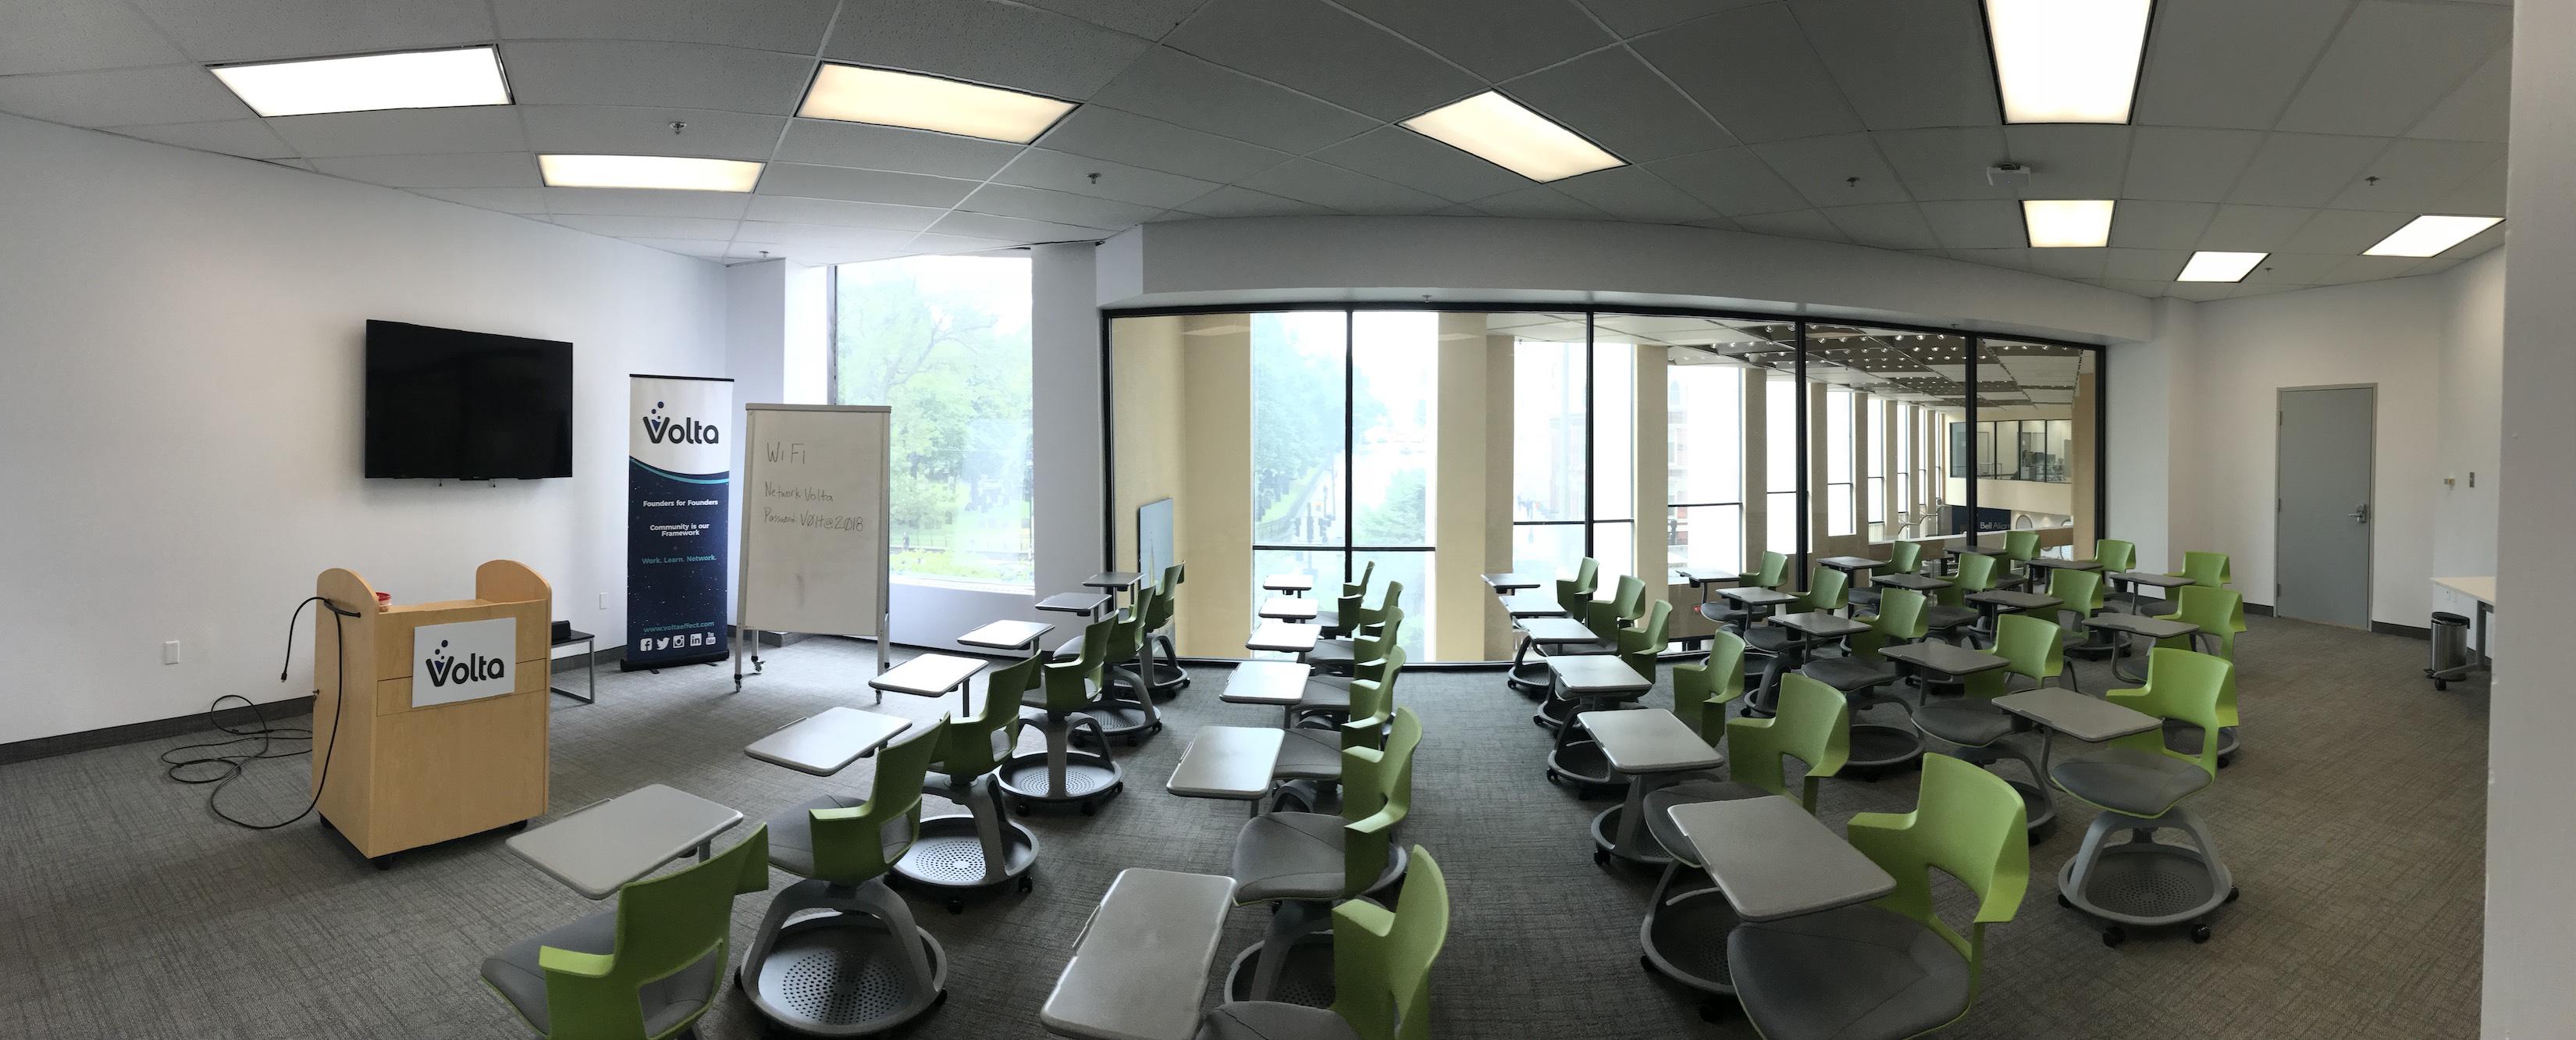 Mezzanine classroom